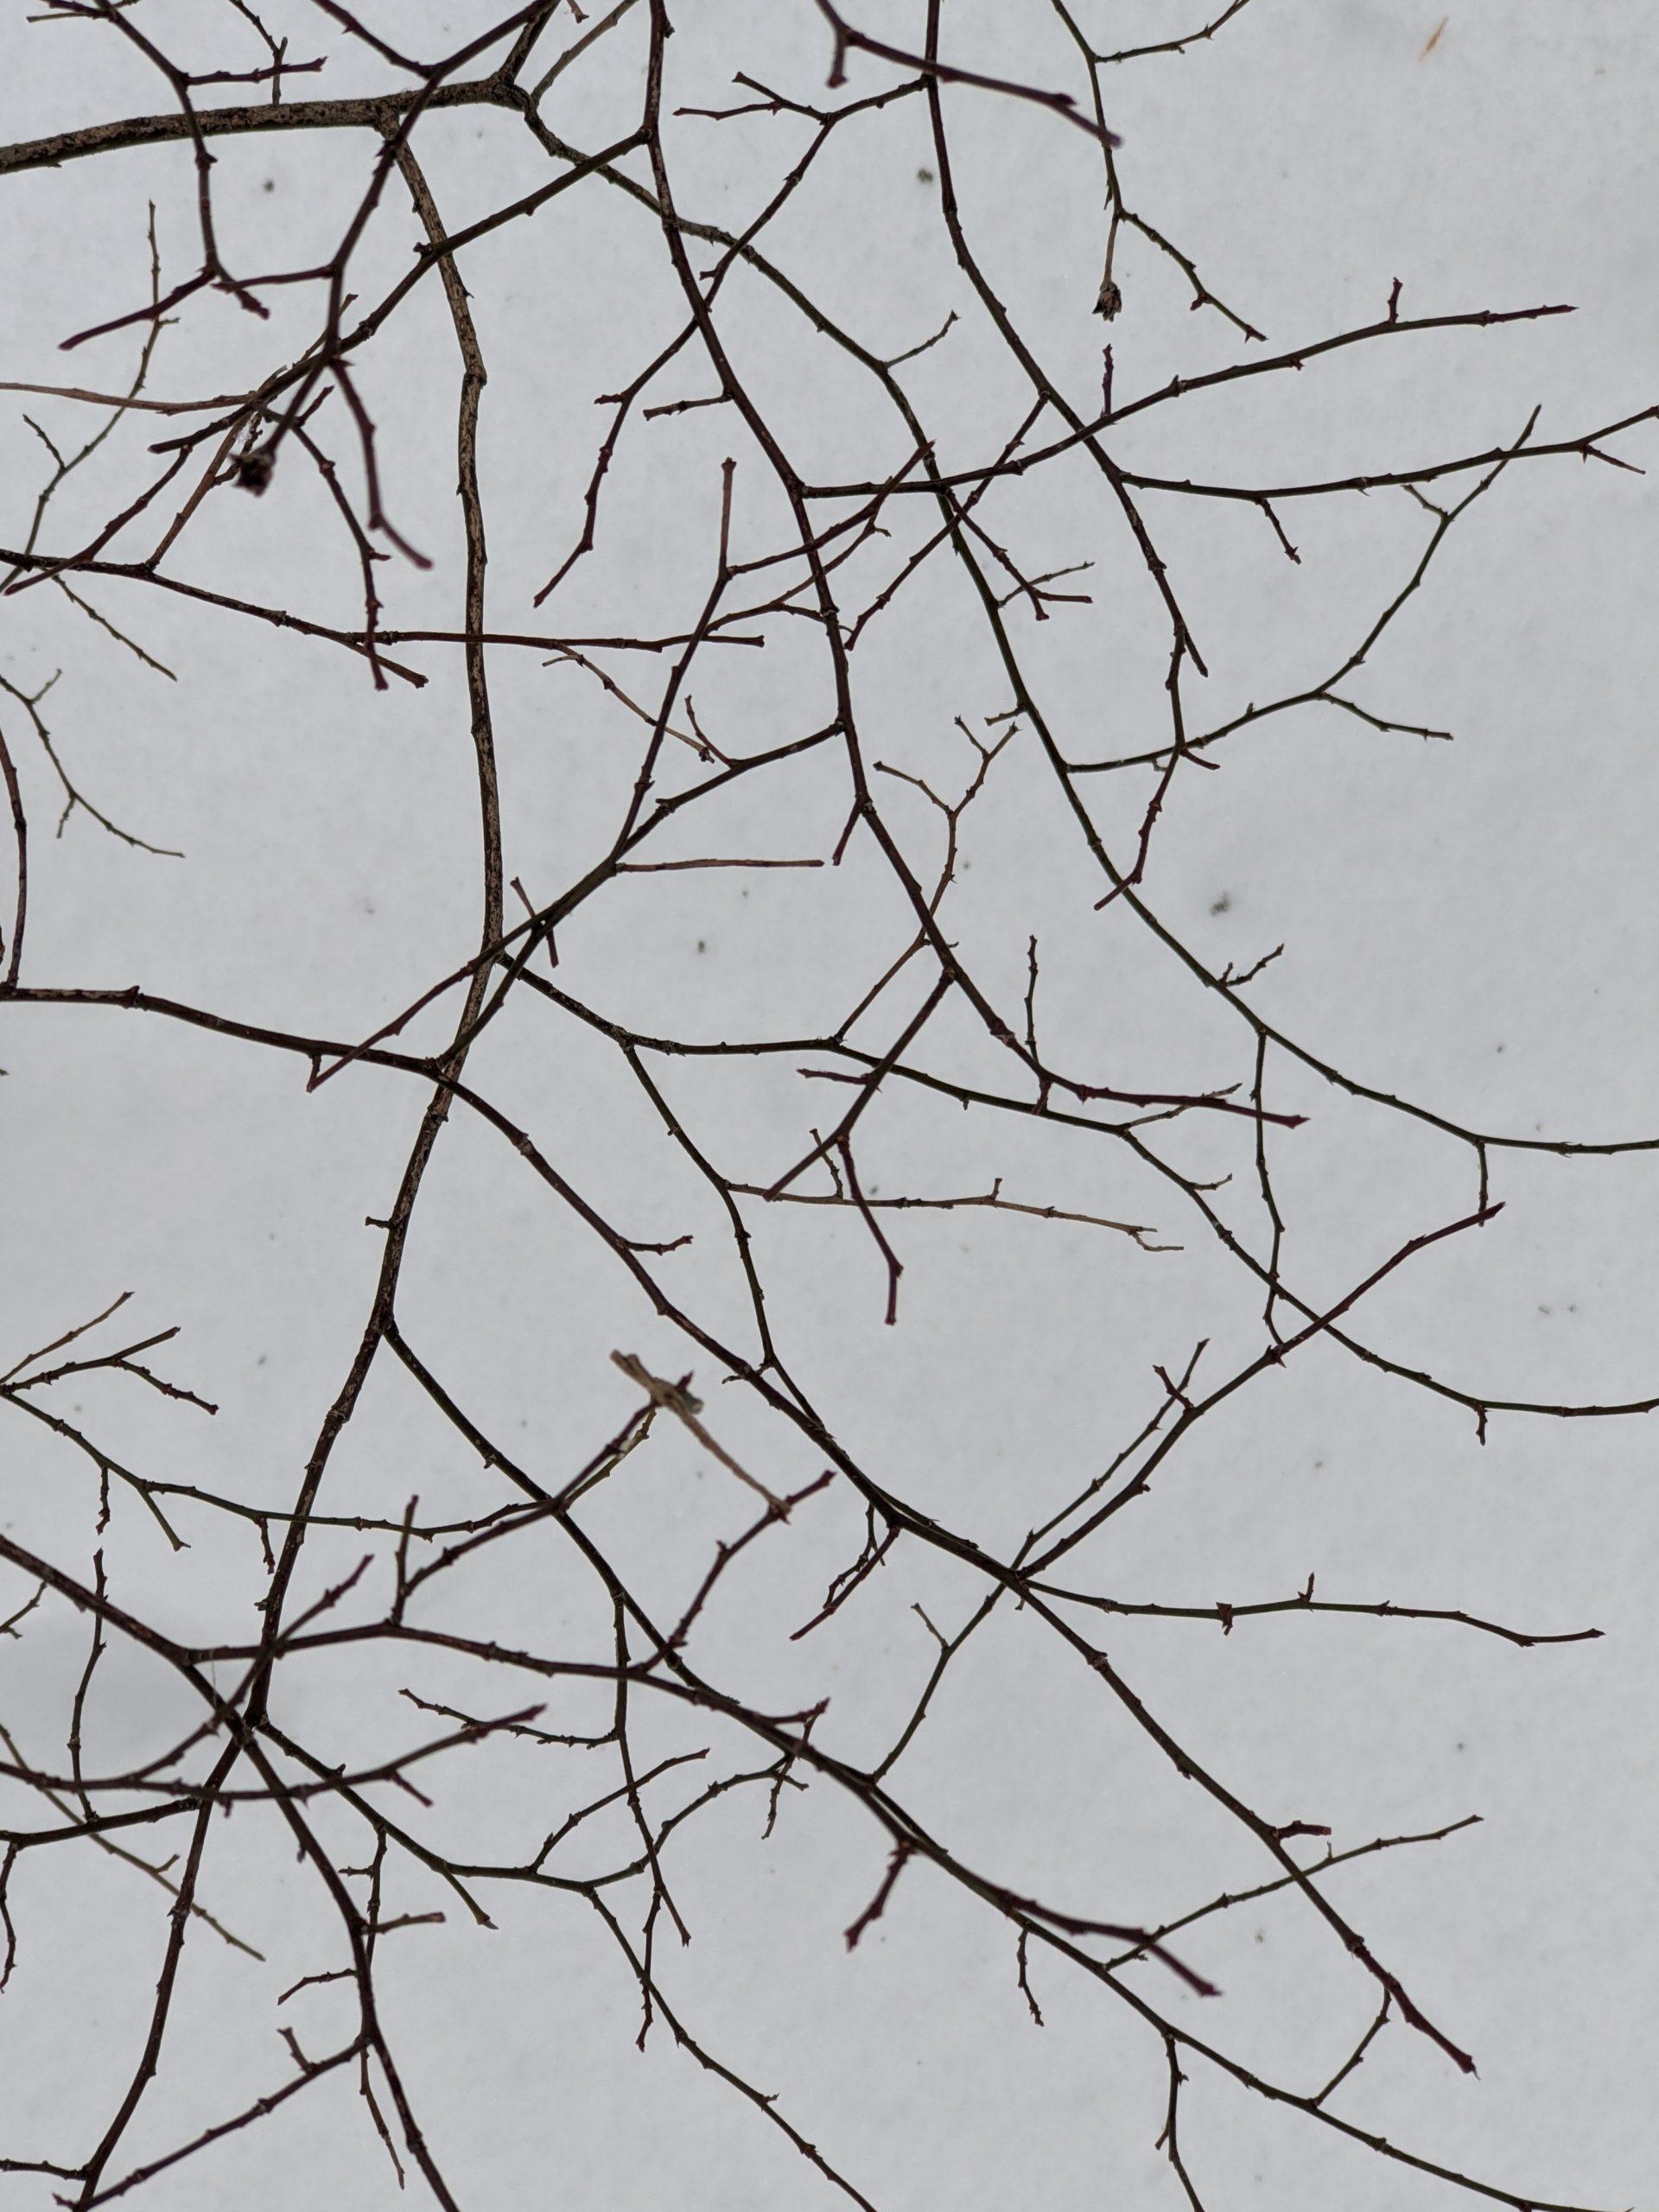 Shrub twigs over snow - Ashland State Park - Dec 2020 Ashland State Park